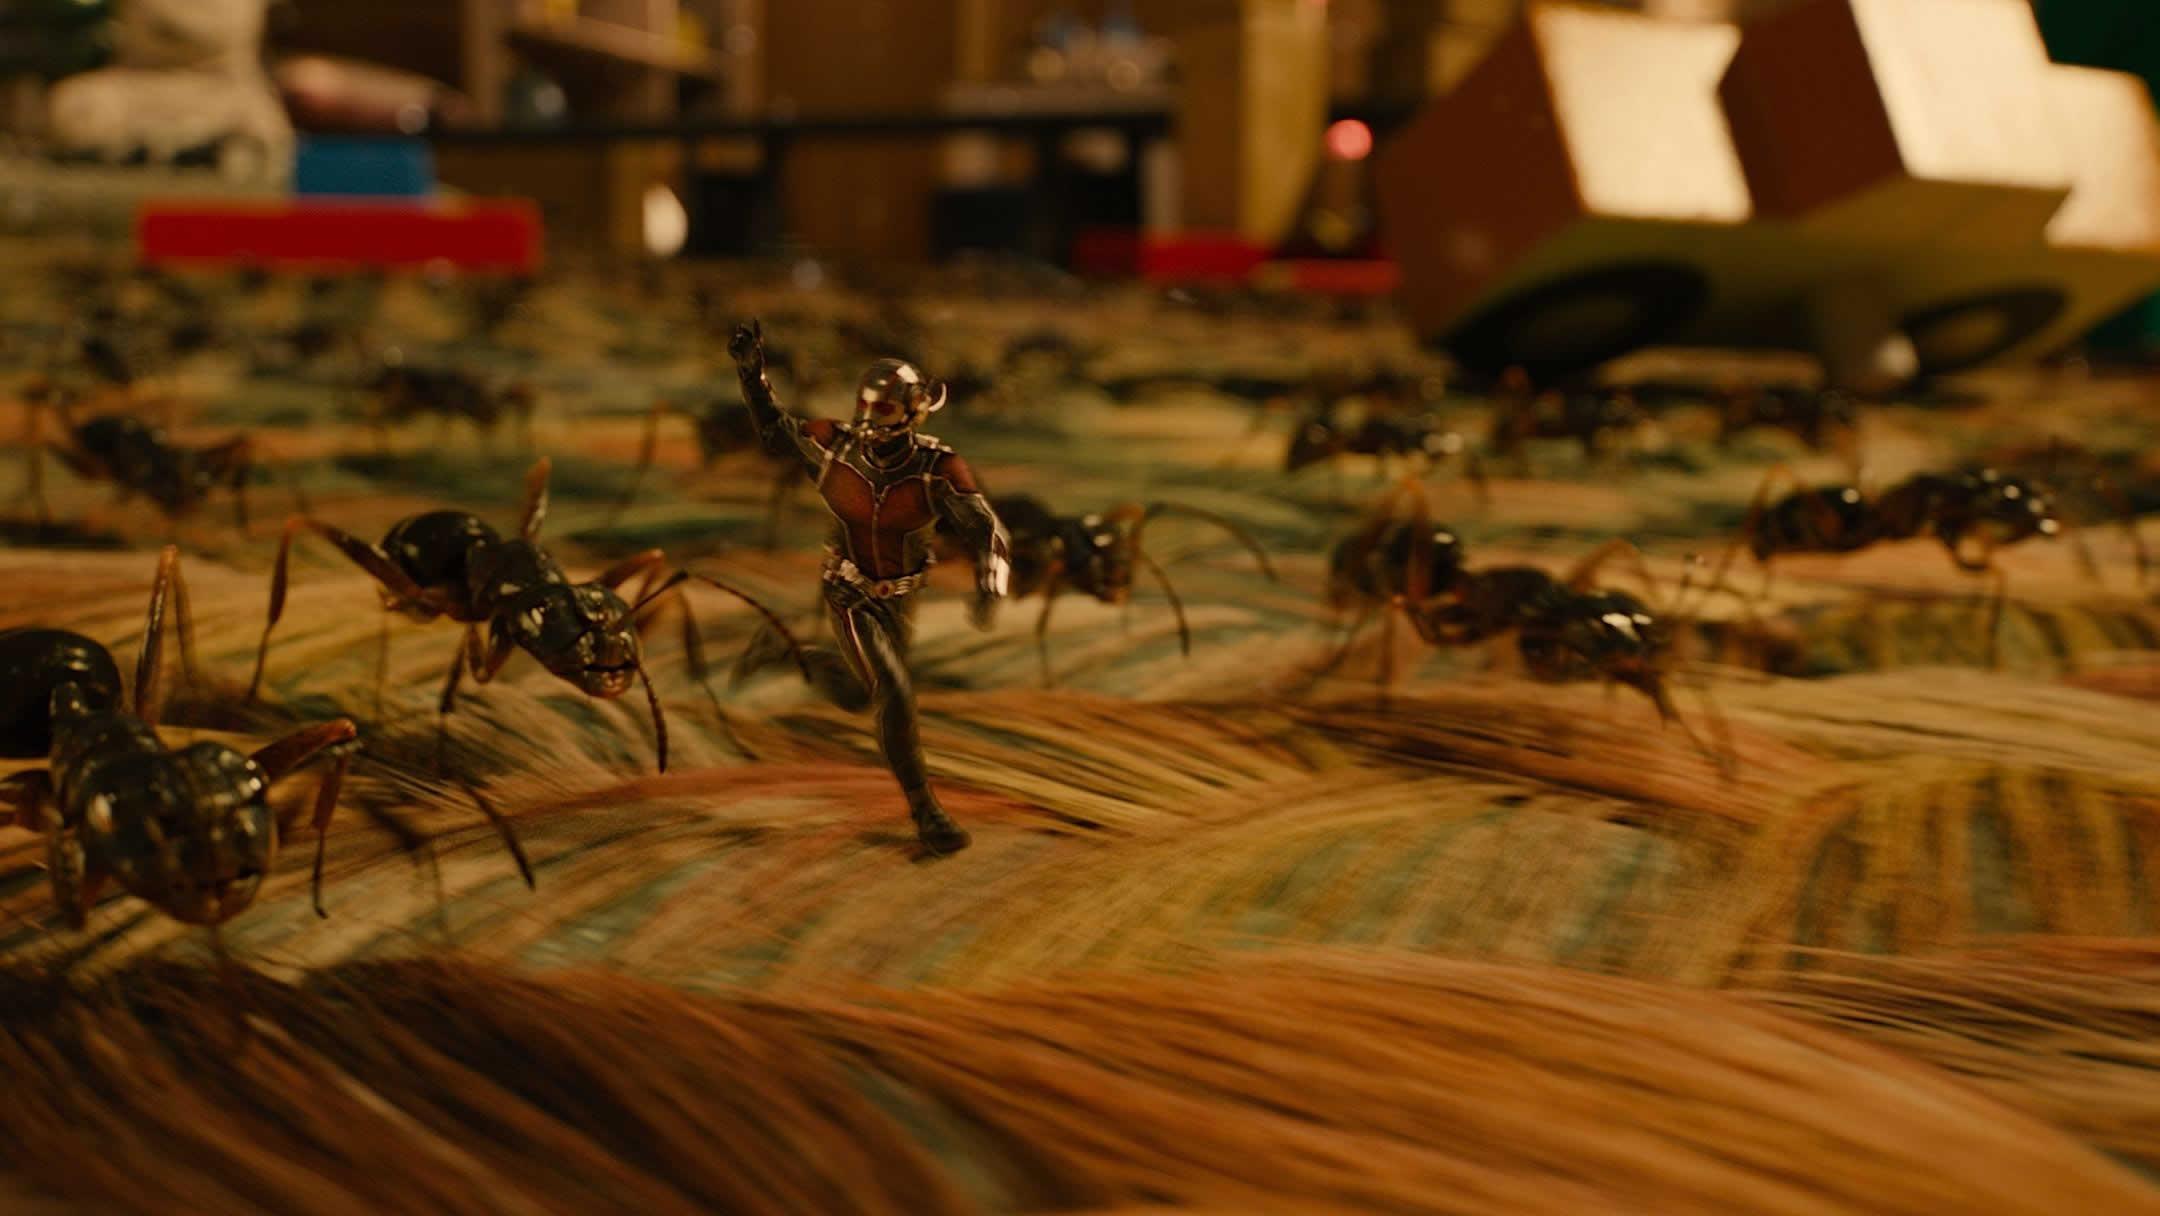 Ant Man Retina Movie Wallpaper: ANTMAN Computer Wallpapers, Desktop Backgrounds